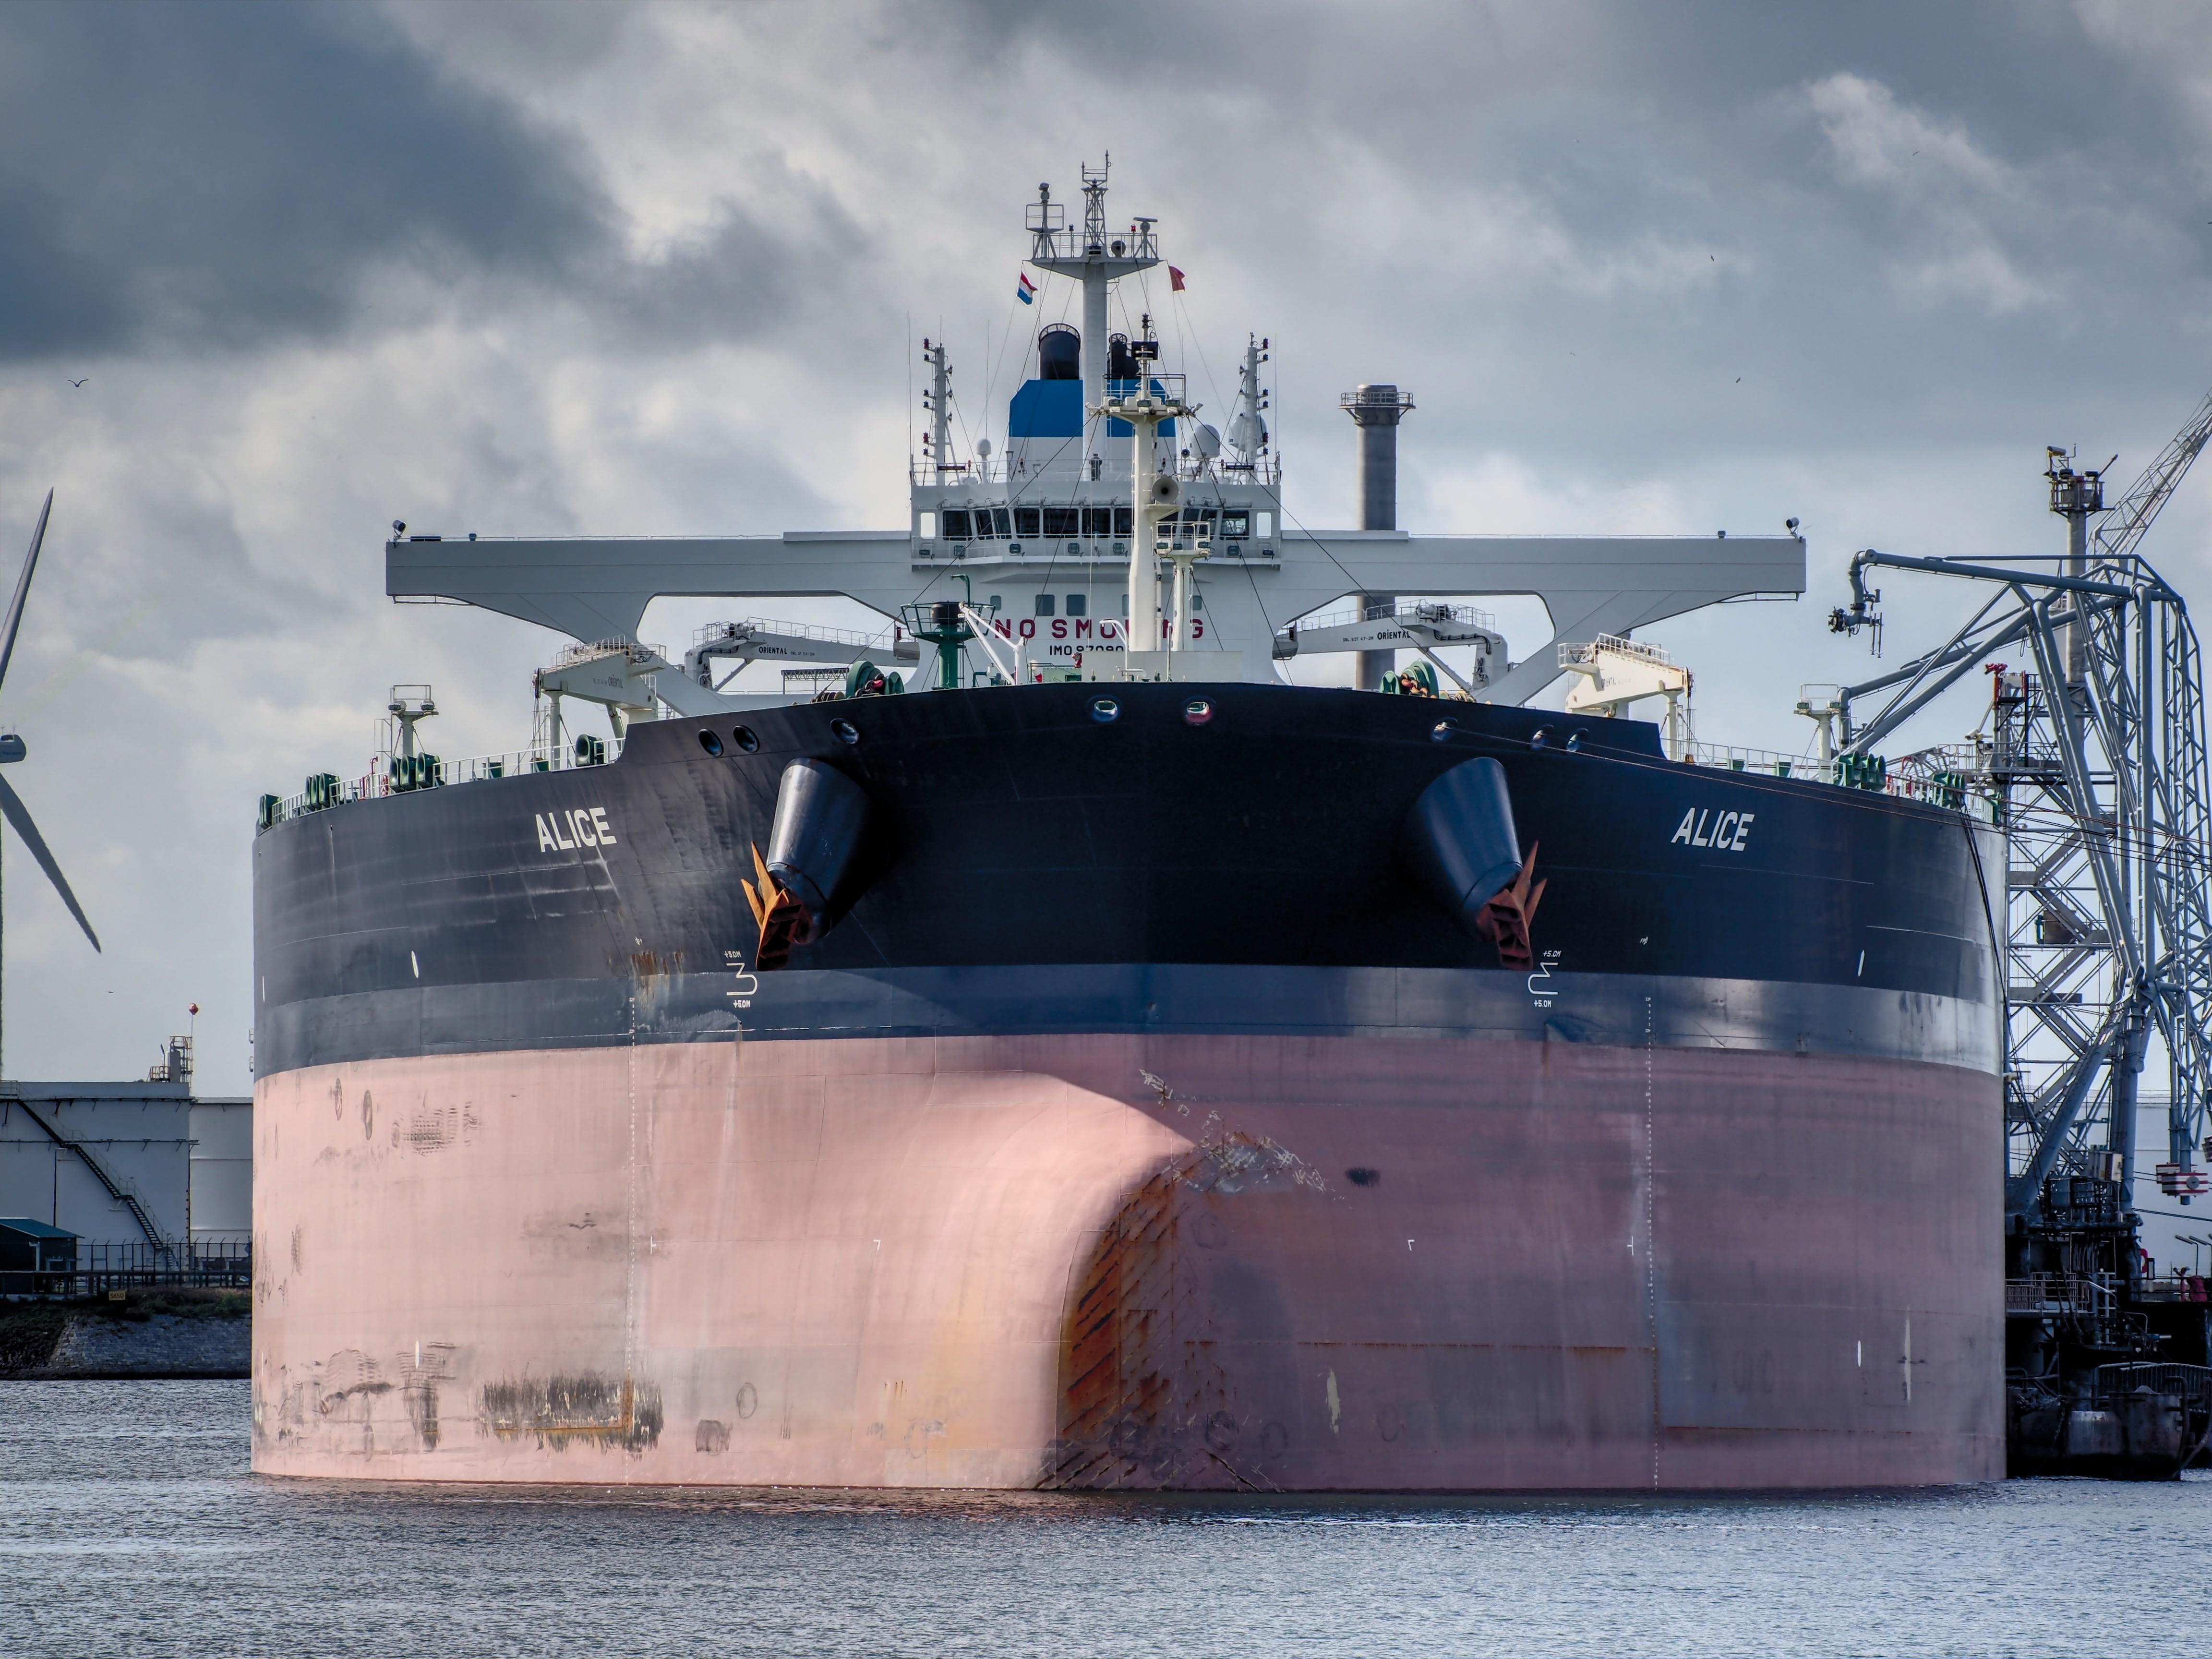 File:Alice (ship, 2016) IMO 9709087, 5e Petroleumhaven, Port